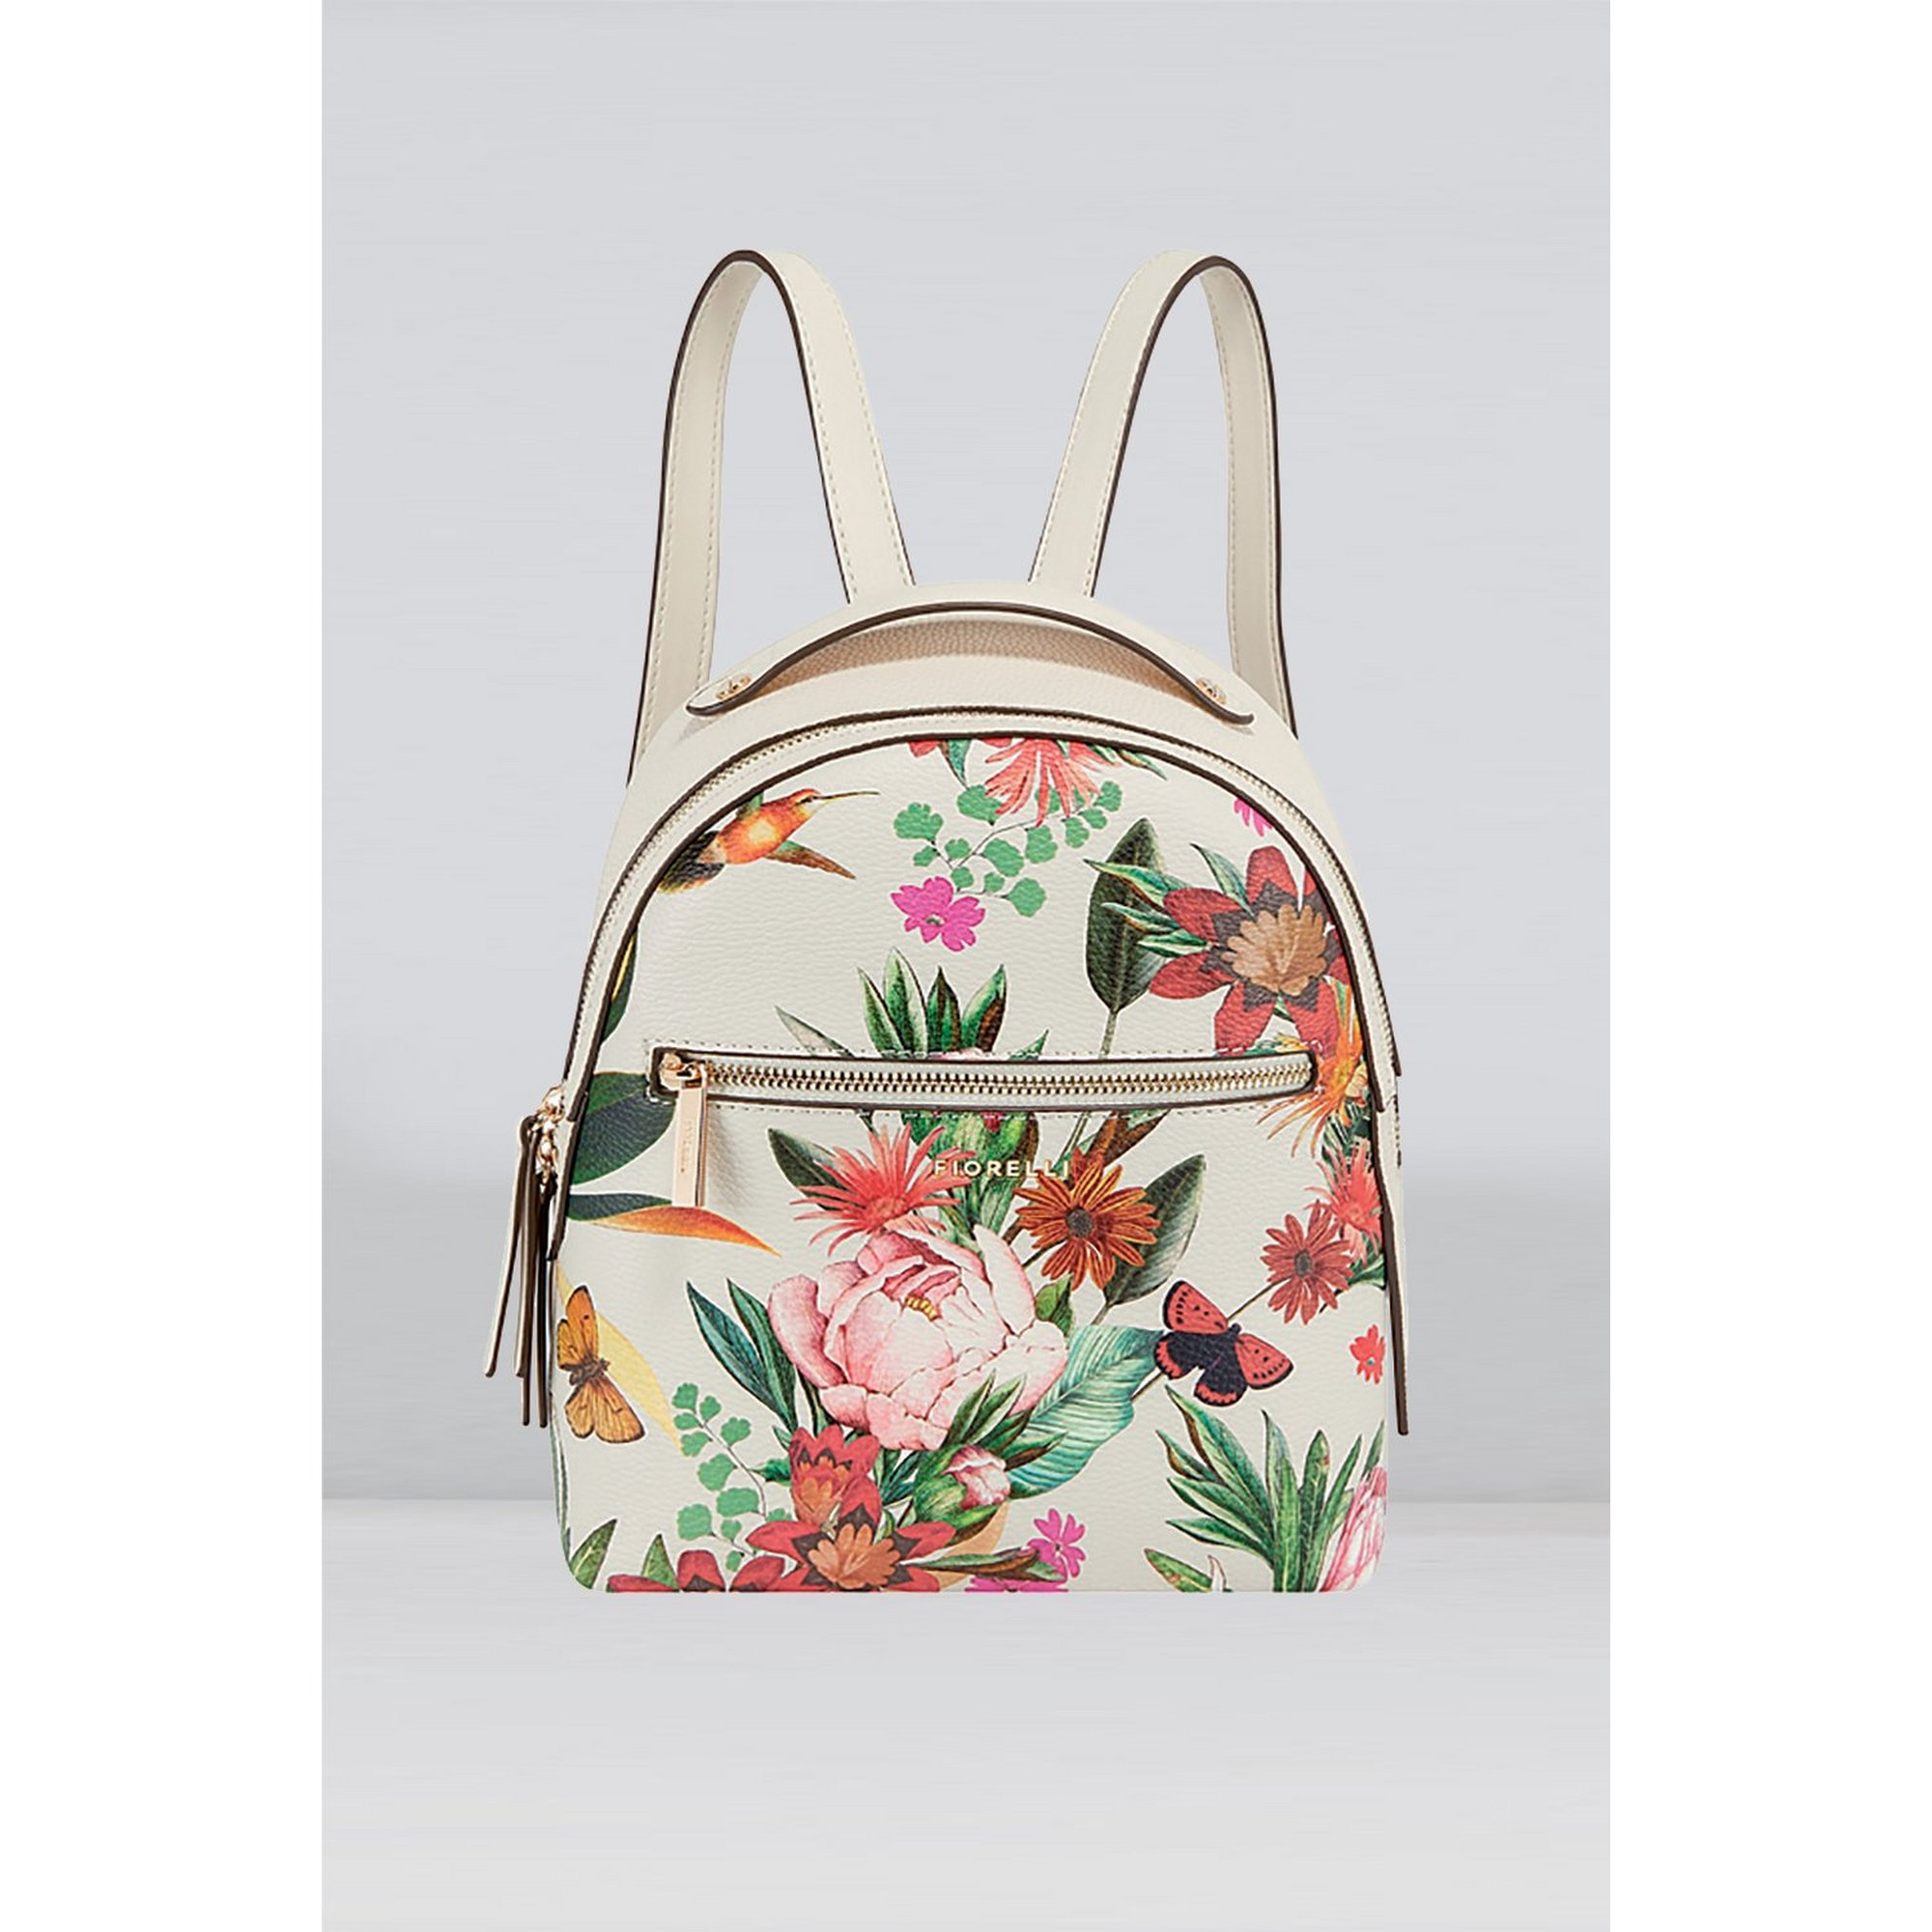 Image of Fiorelli Anouk Savanna Print Backpack